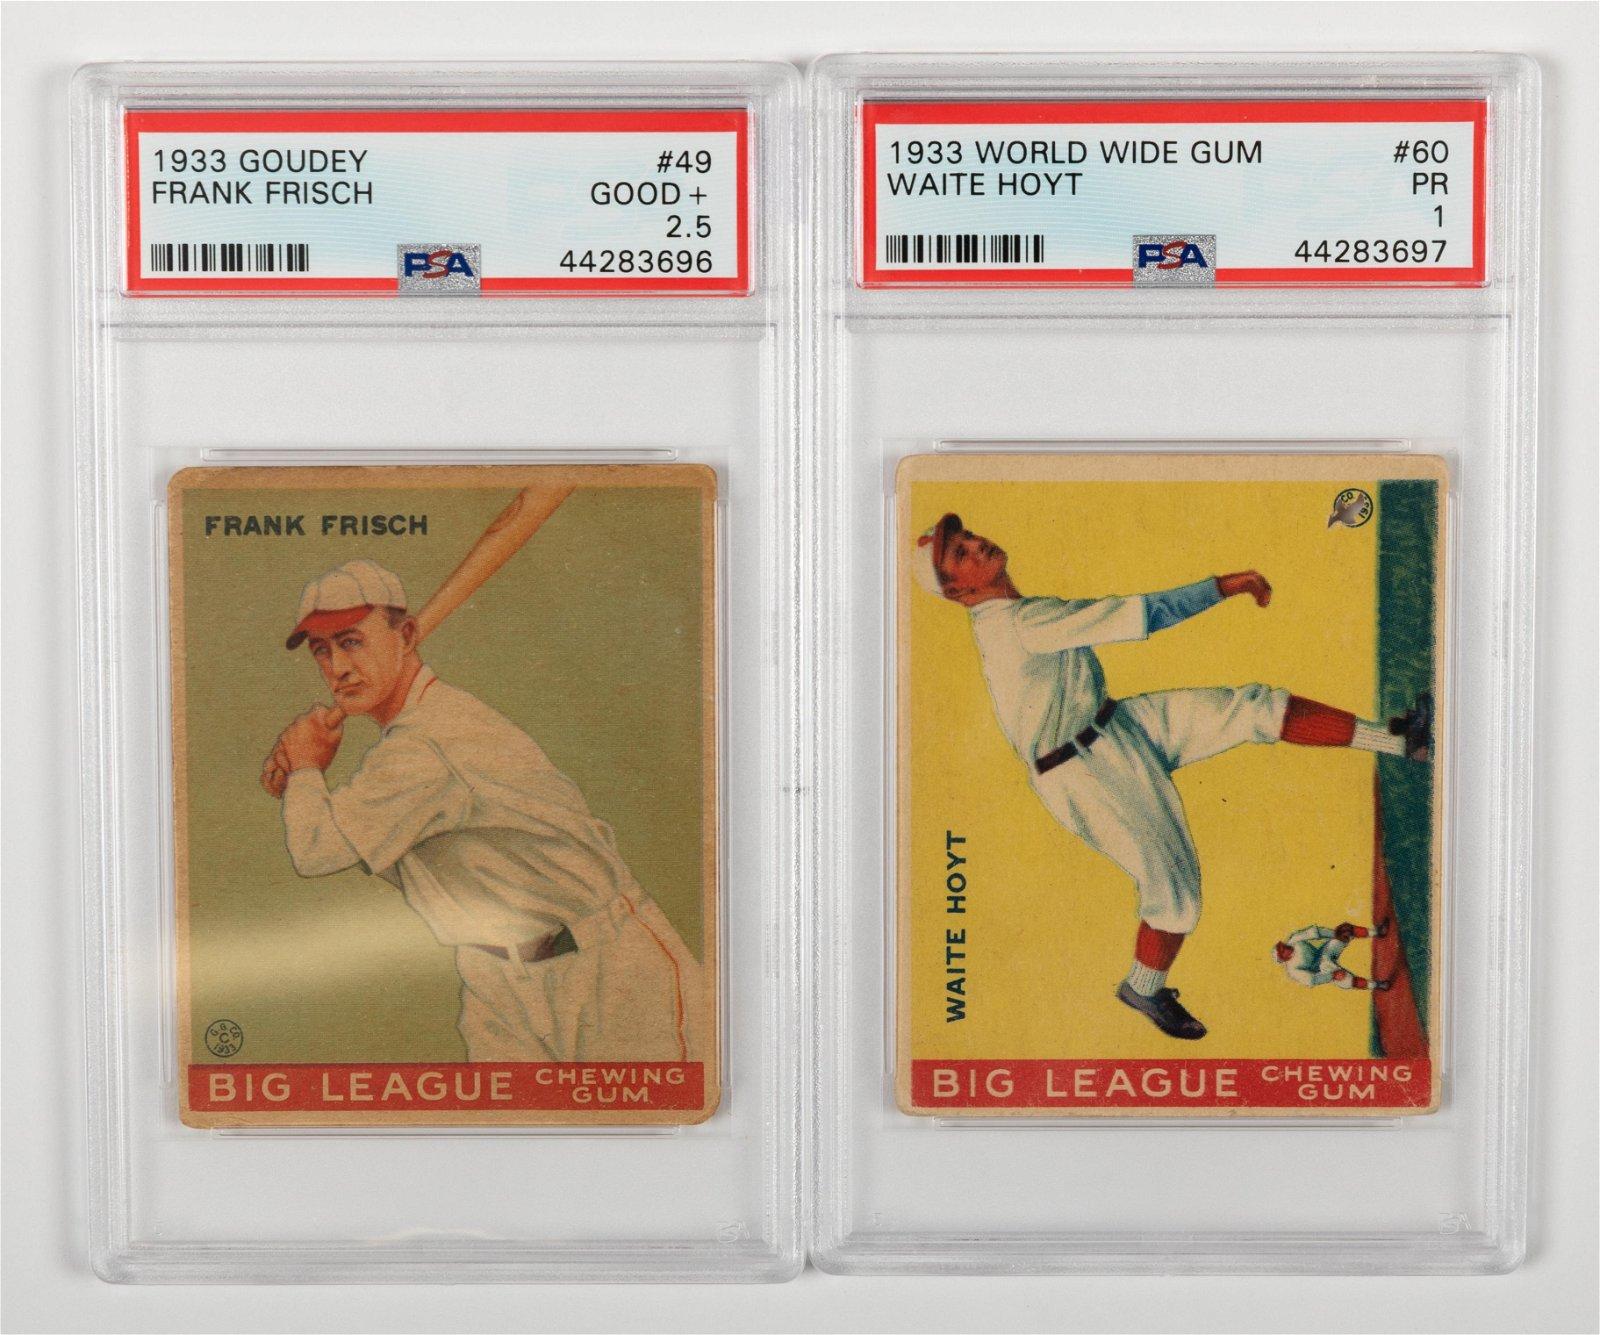 Goudey - 1933 Frisch & Hoyt Baseball Cards